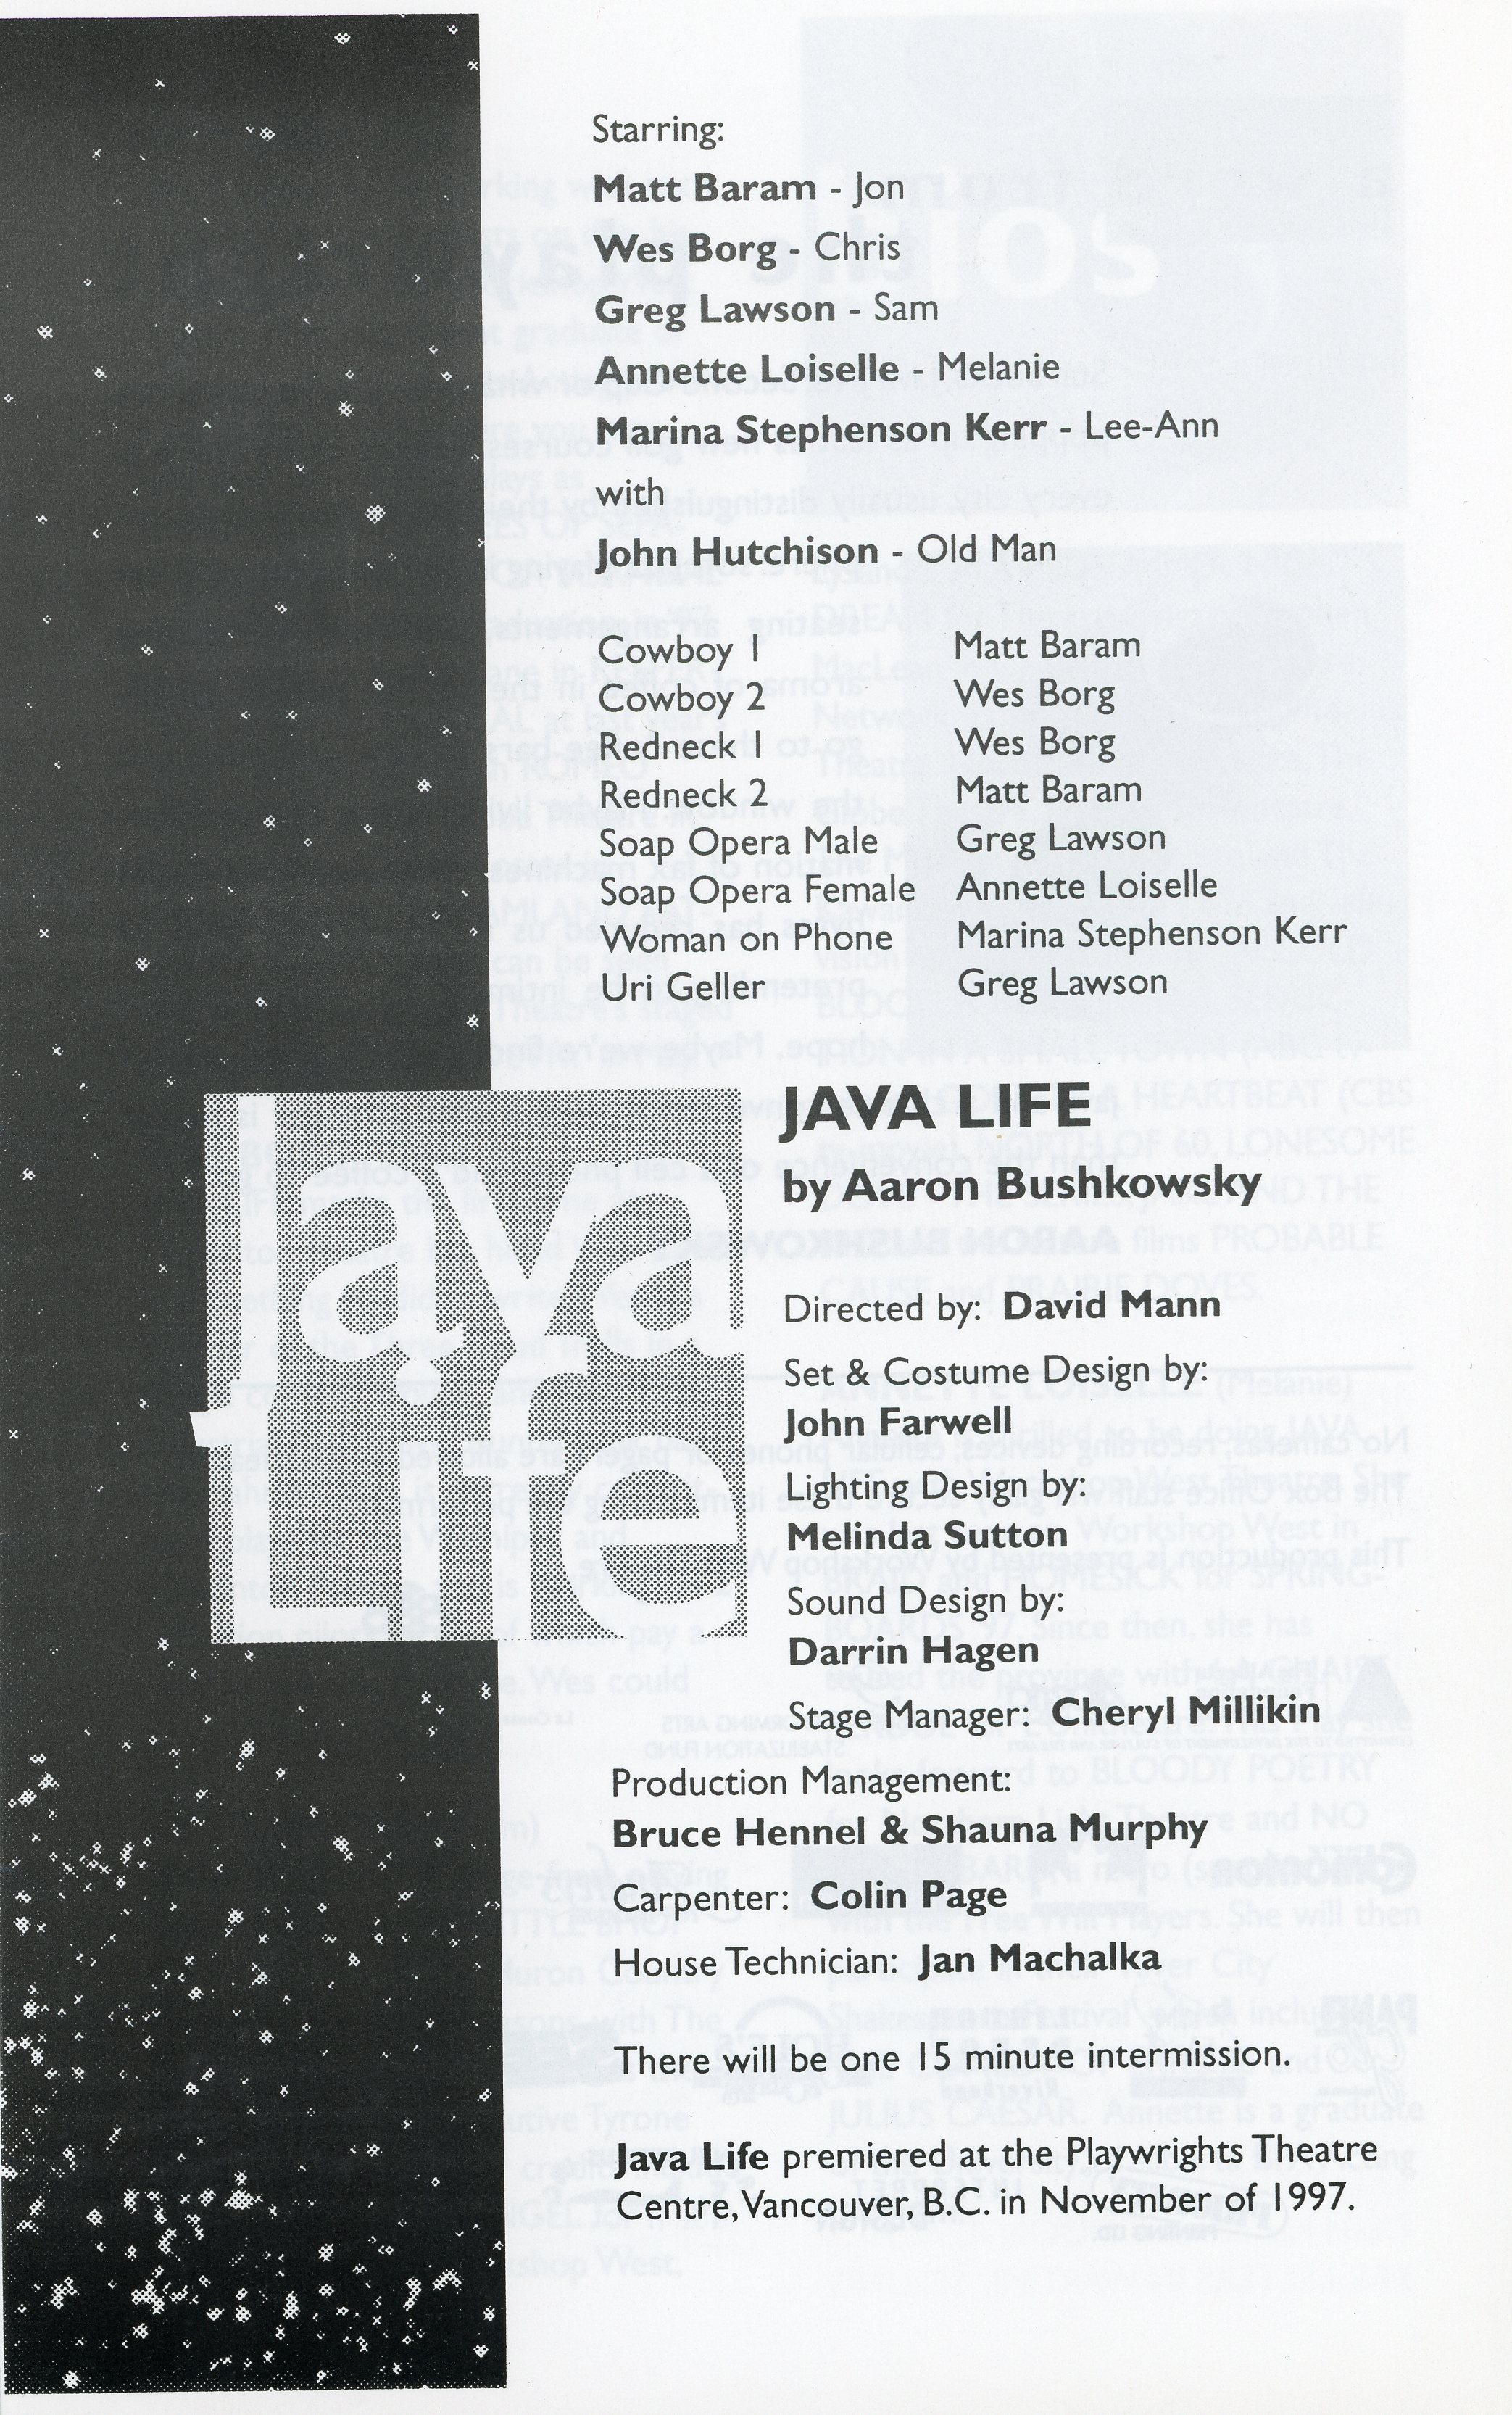 Jave Life (1997)-Production Information_JPEG.jpg